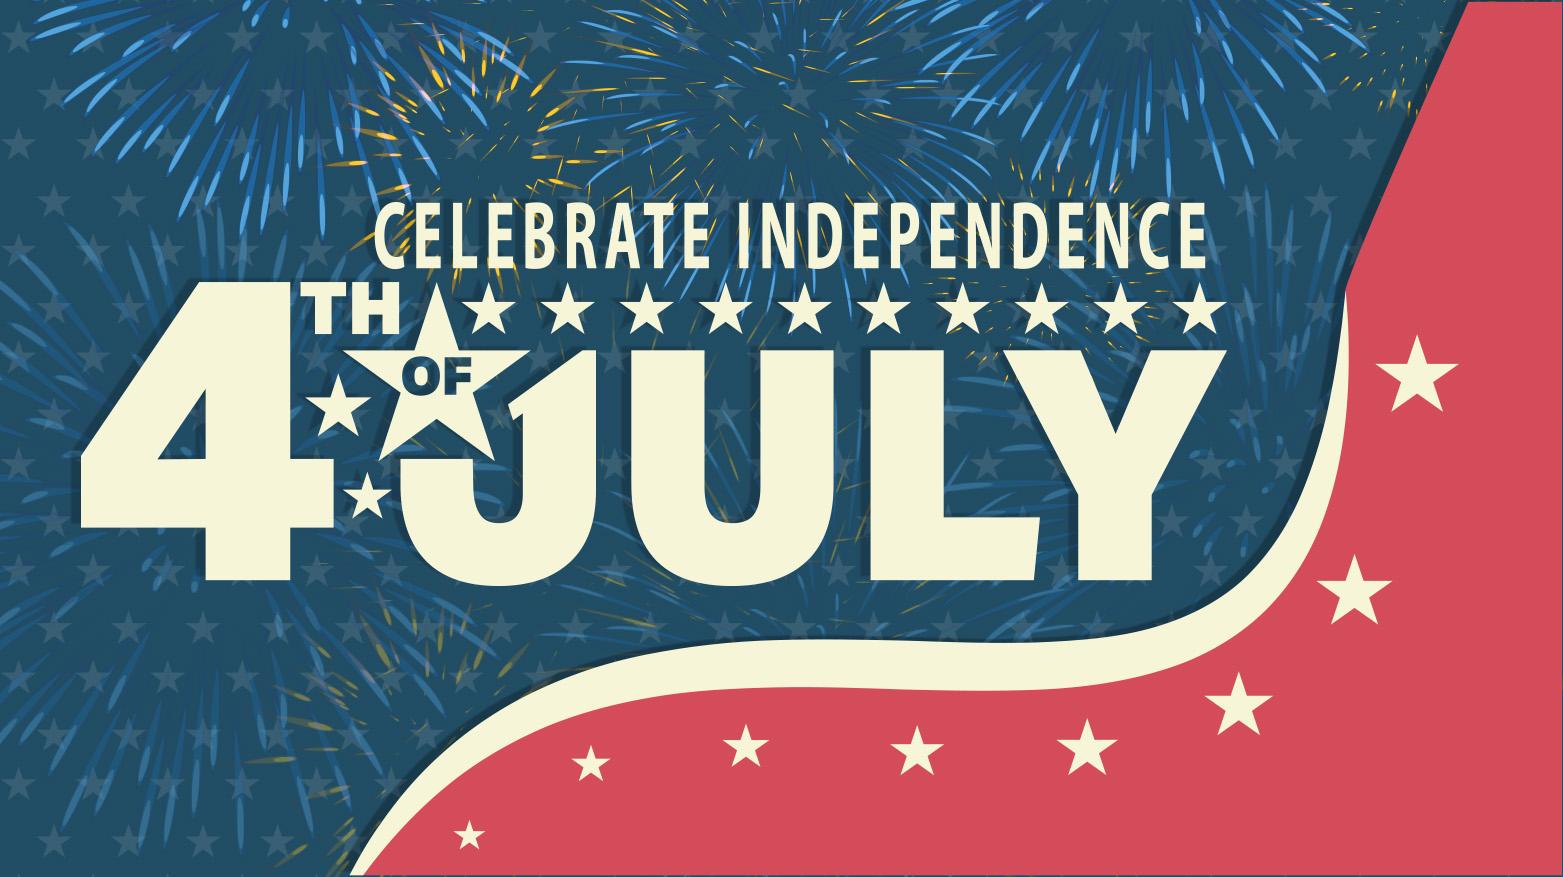 Celebrate Independence!